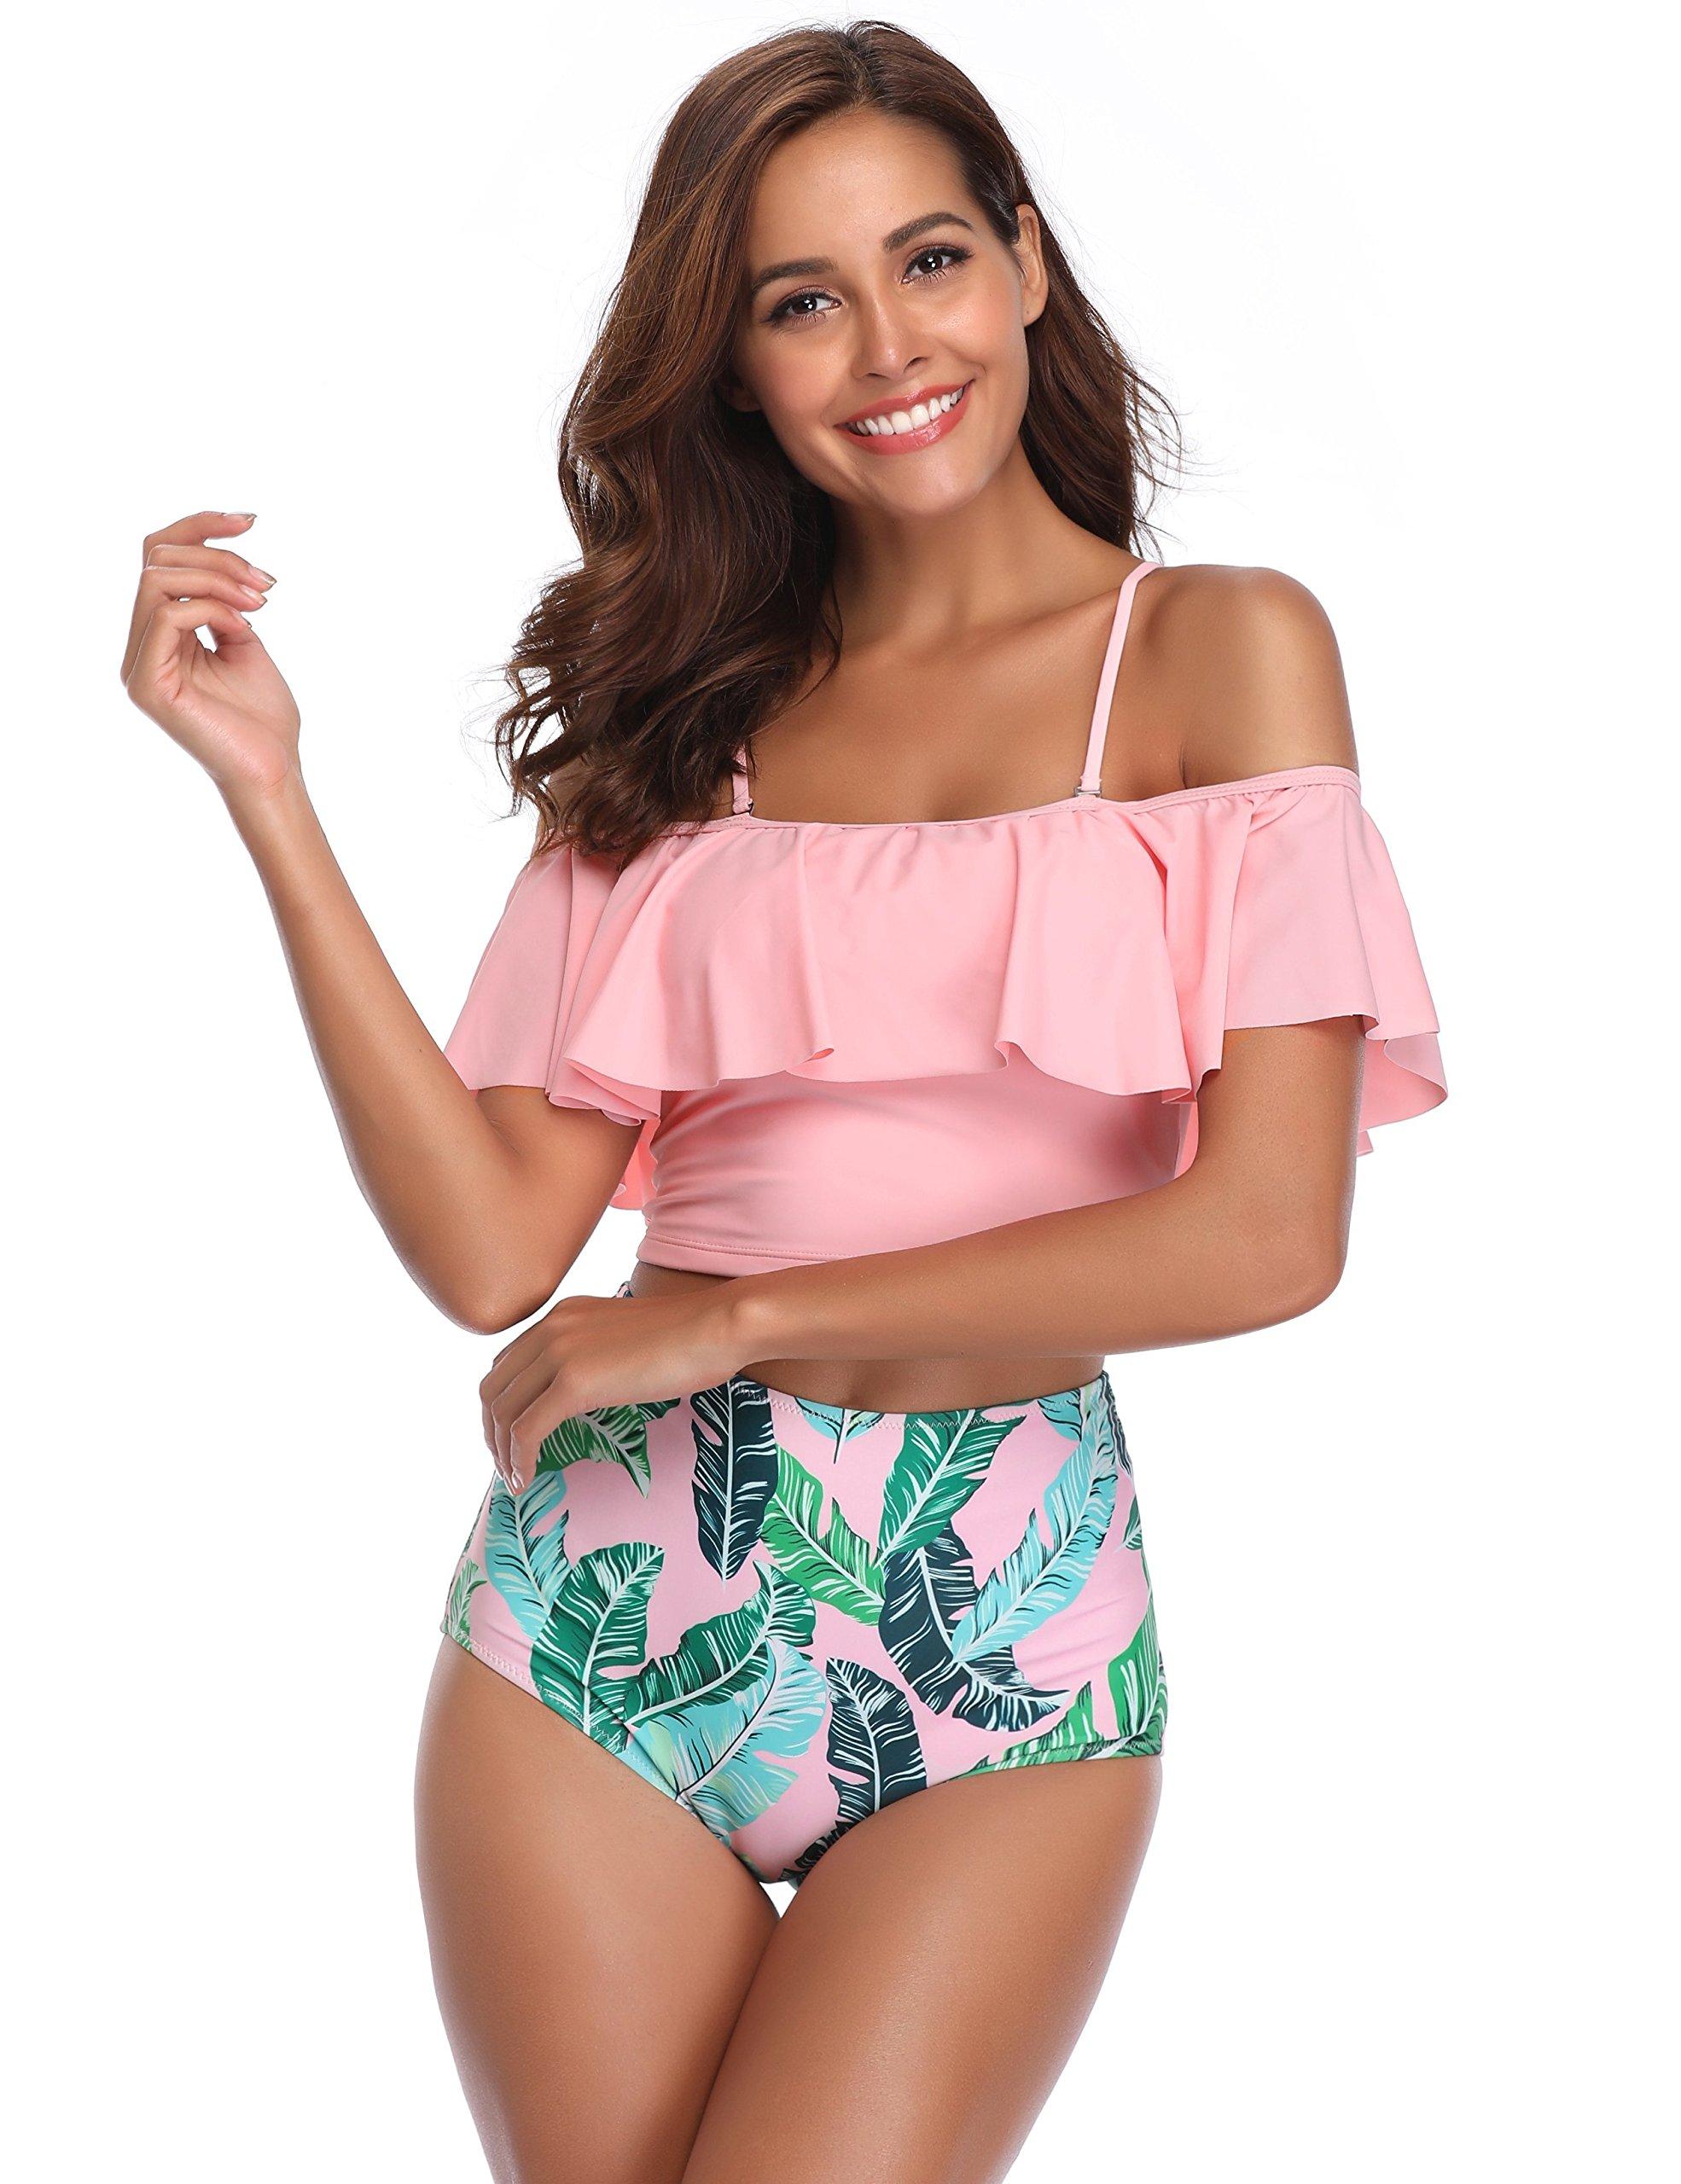 MarinaVida Women Off Shoulder Ruffle Swimsuit Crop Top Two Piece Bathing Suit